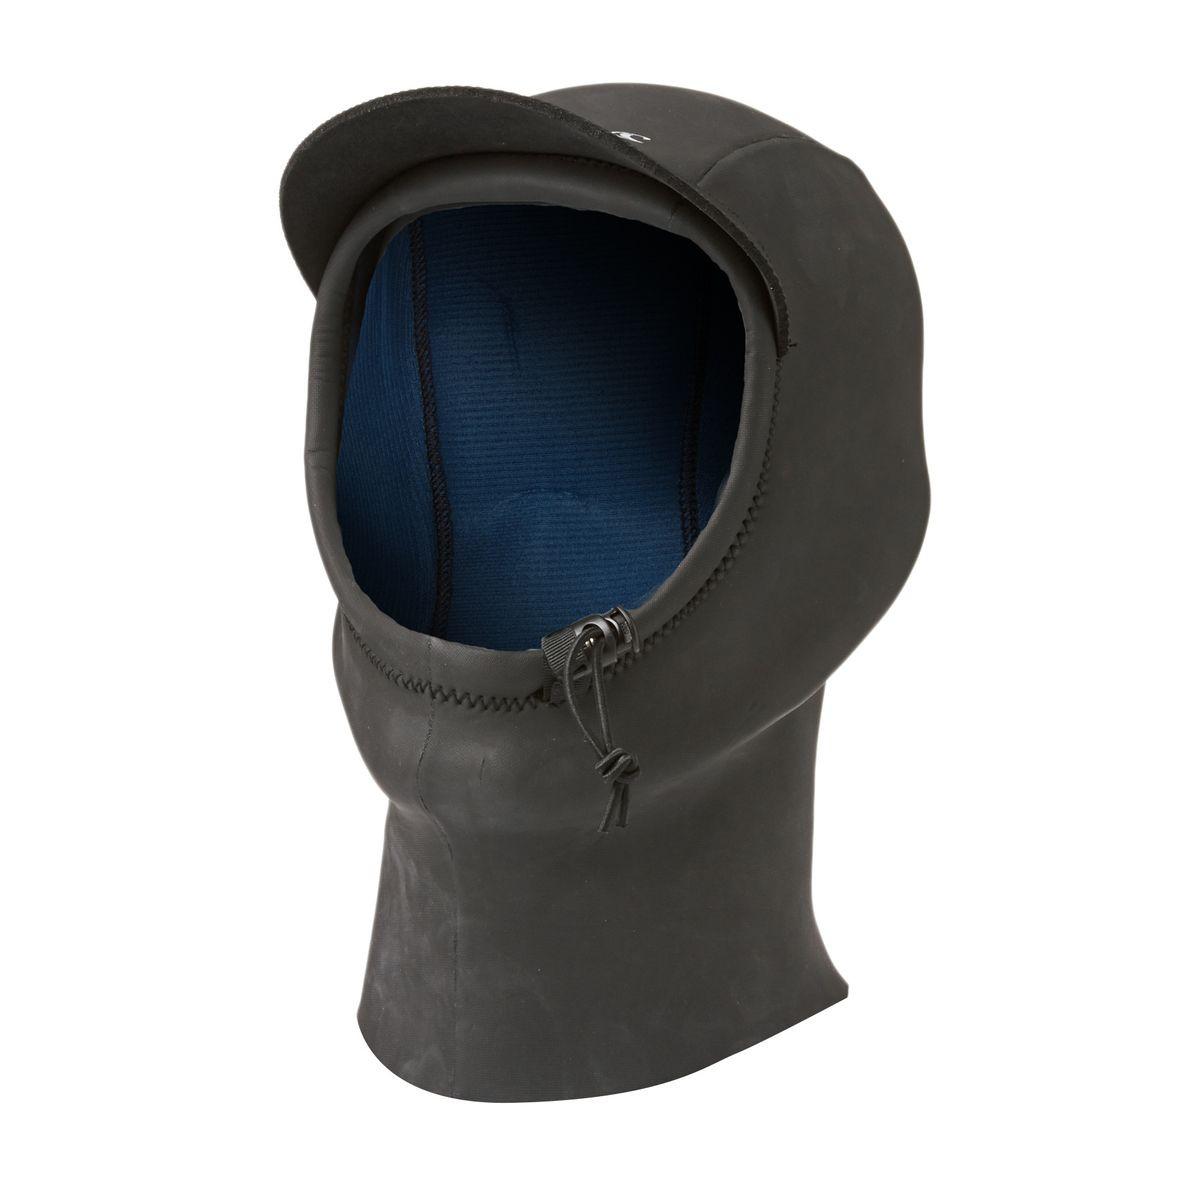 O'Neill Hyperfreak Wetsuit Hood - 1.5mm